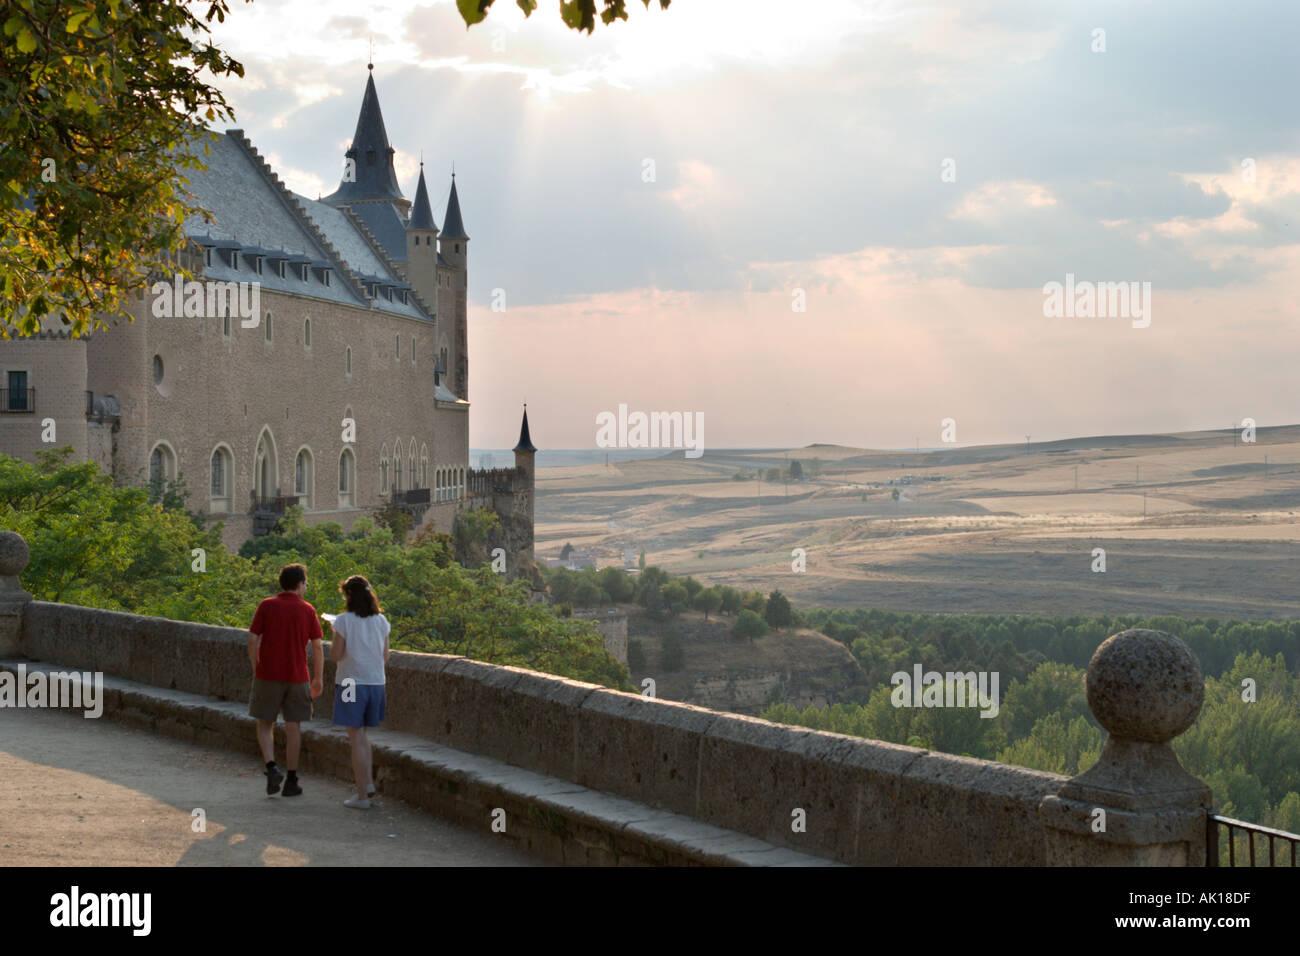 Couple walking towards the Alcazar in the early evening, Segovia, Castilla y Leon, Spain - Stock Image